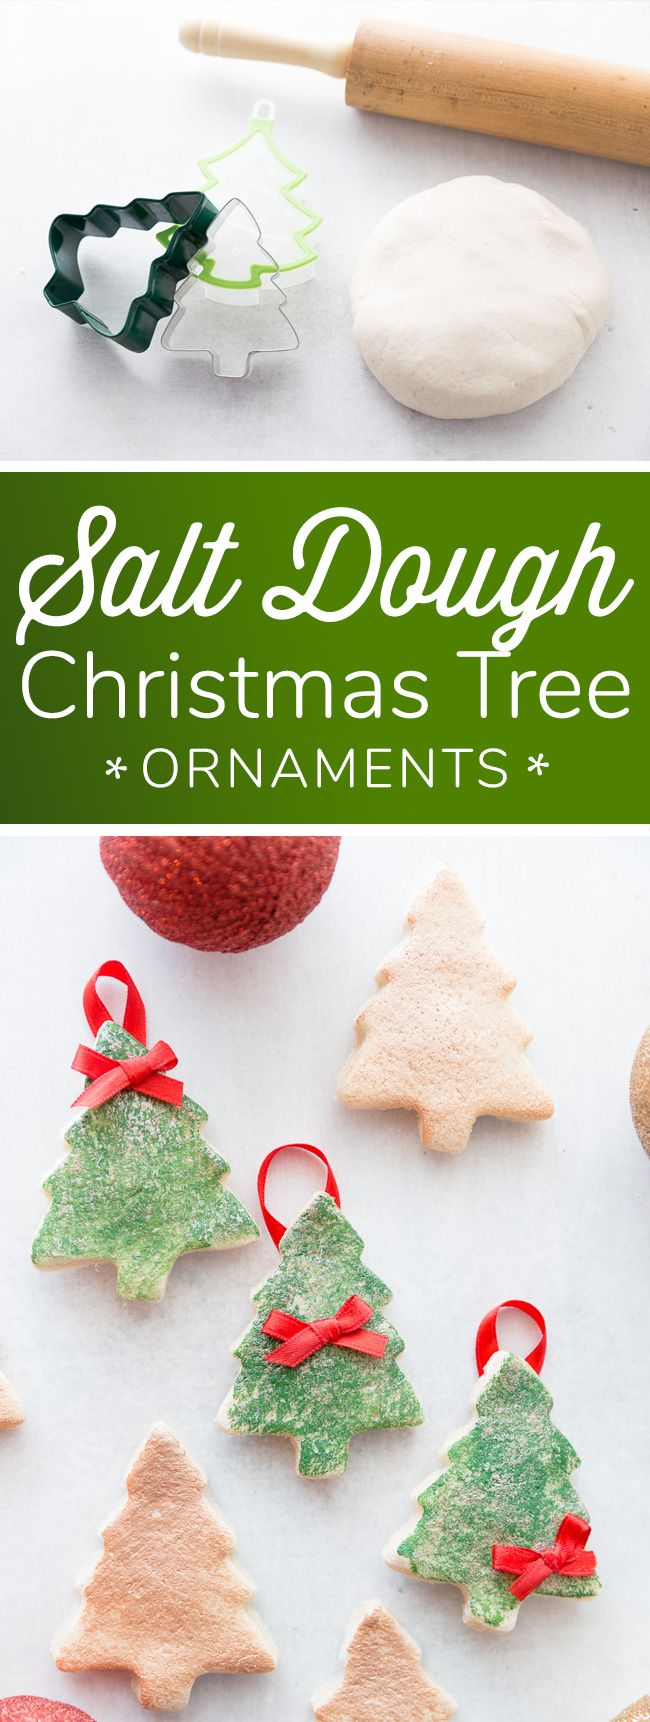 Diy Salt Dough Christmas Tree Ornaments Easy Salt Dough Ornament Recipe Diy Christmas Tree Ornaments Christmas Ornaments Kids Ornaments